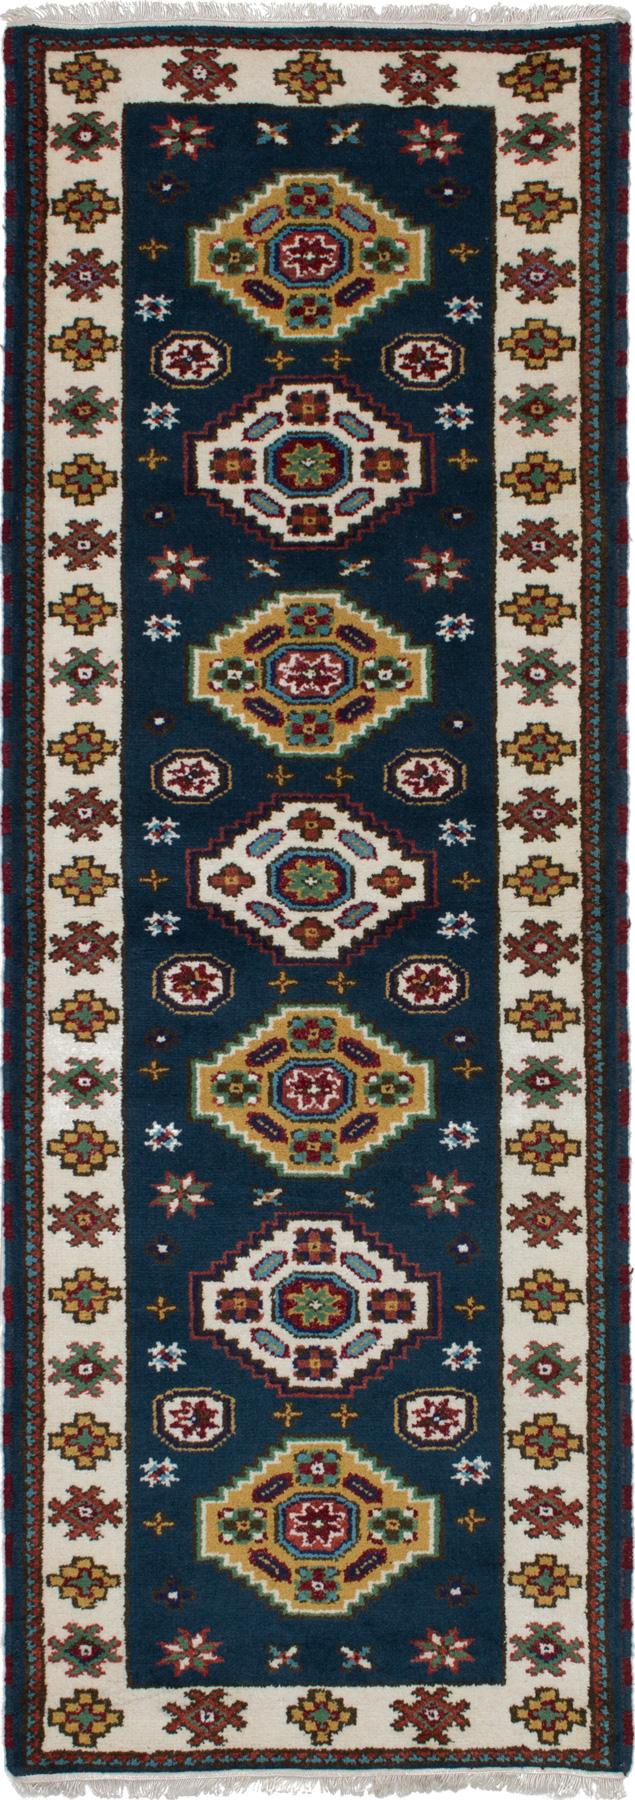 "Hand-knotted Royal Kazak Dark Navy Wool Rug 2'9"" x 8'5"" Size: 2'9"" x 8'5"""